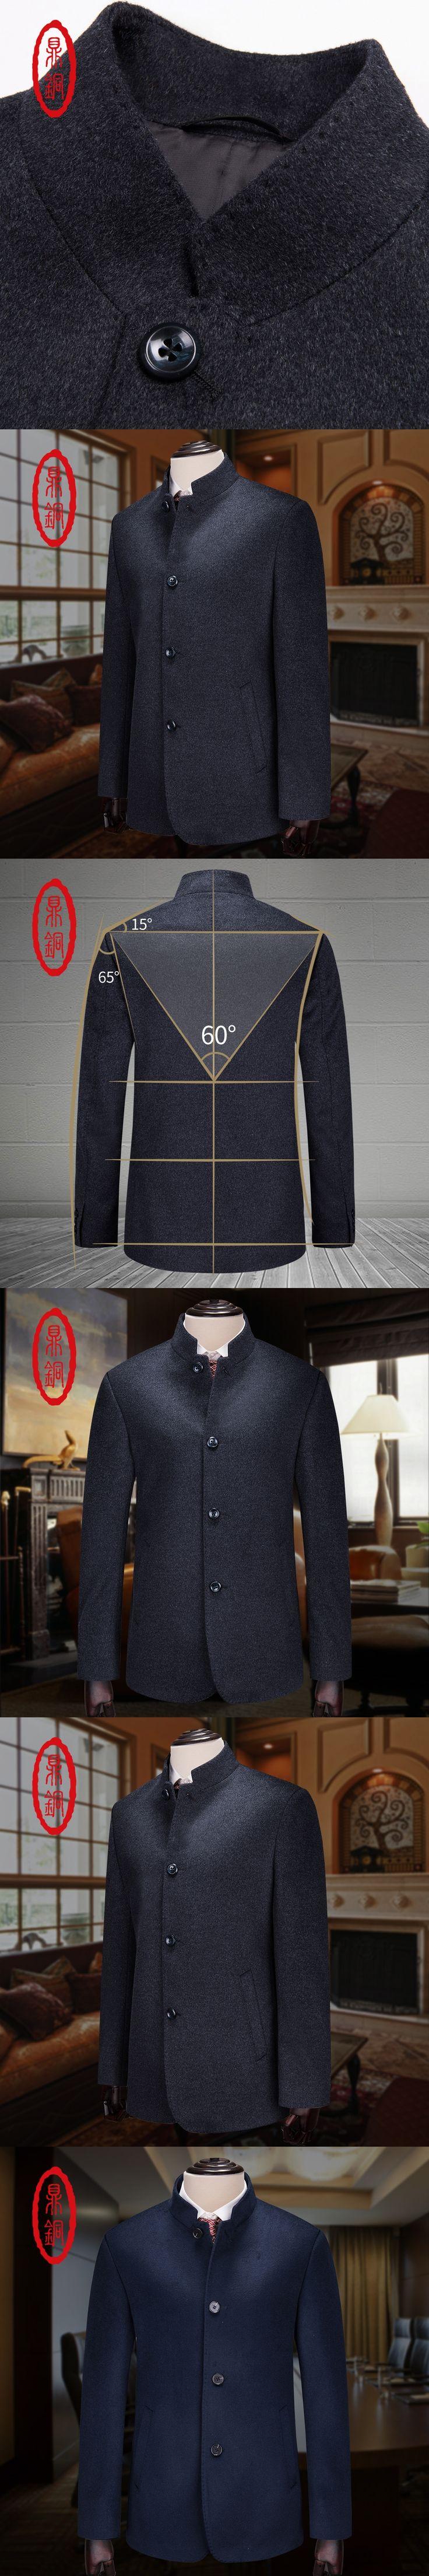 2017 Brand Fashion Men's Autumn Winter Coat Turn-down Collar Wool Blend Men PeaCoat men jacket men wool cashmere Overcoat 70102